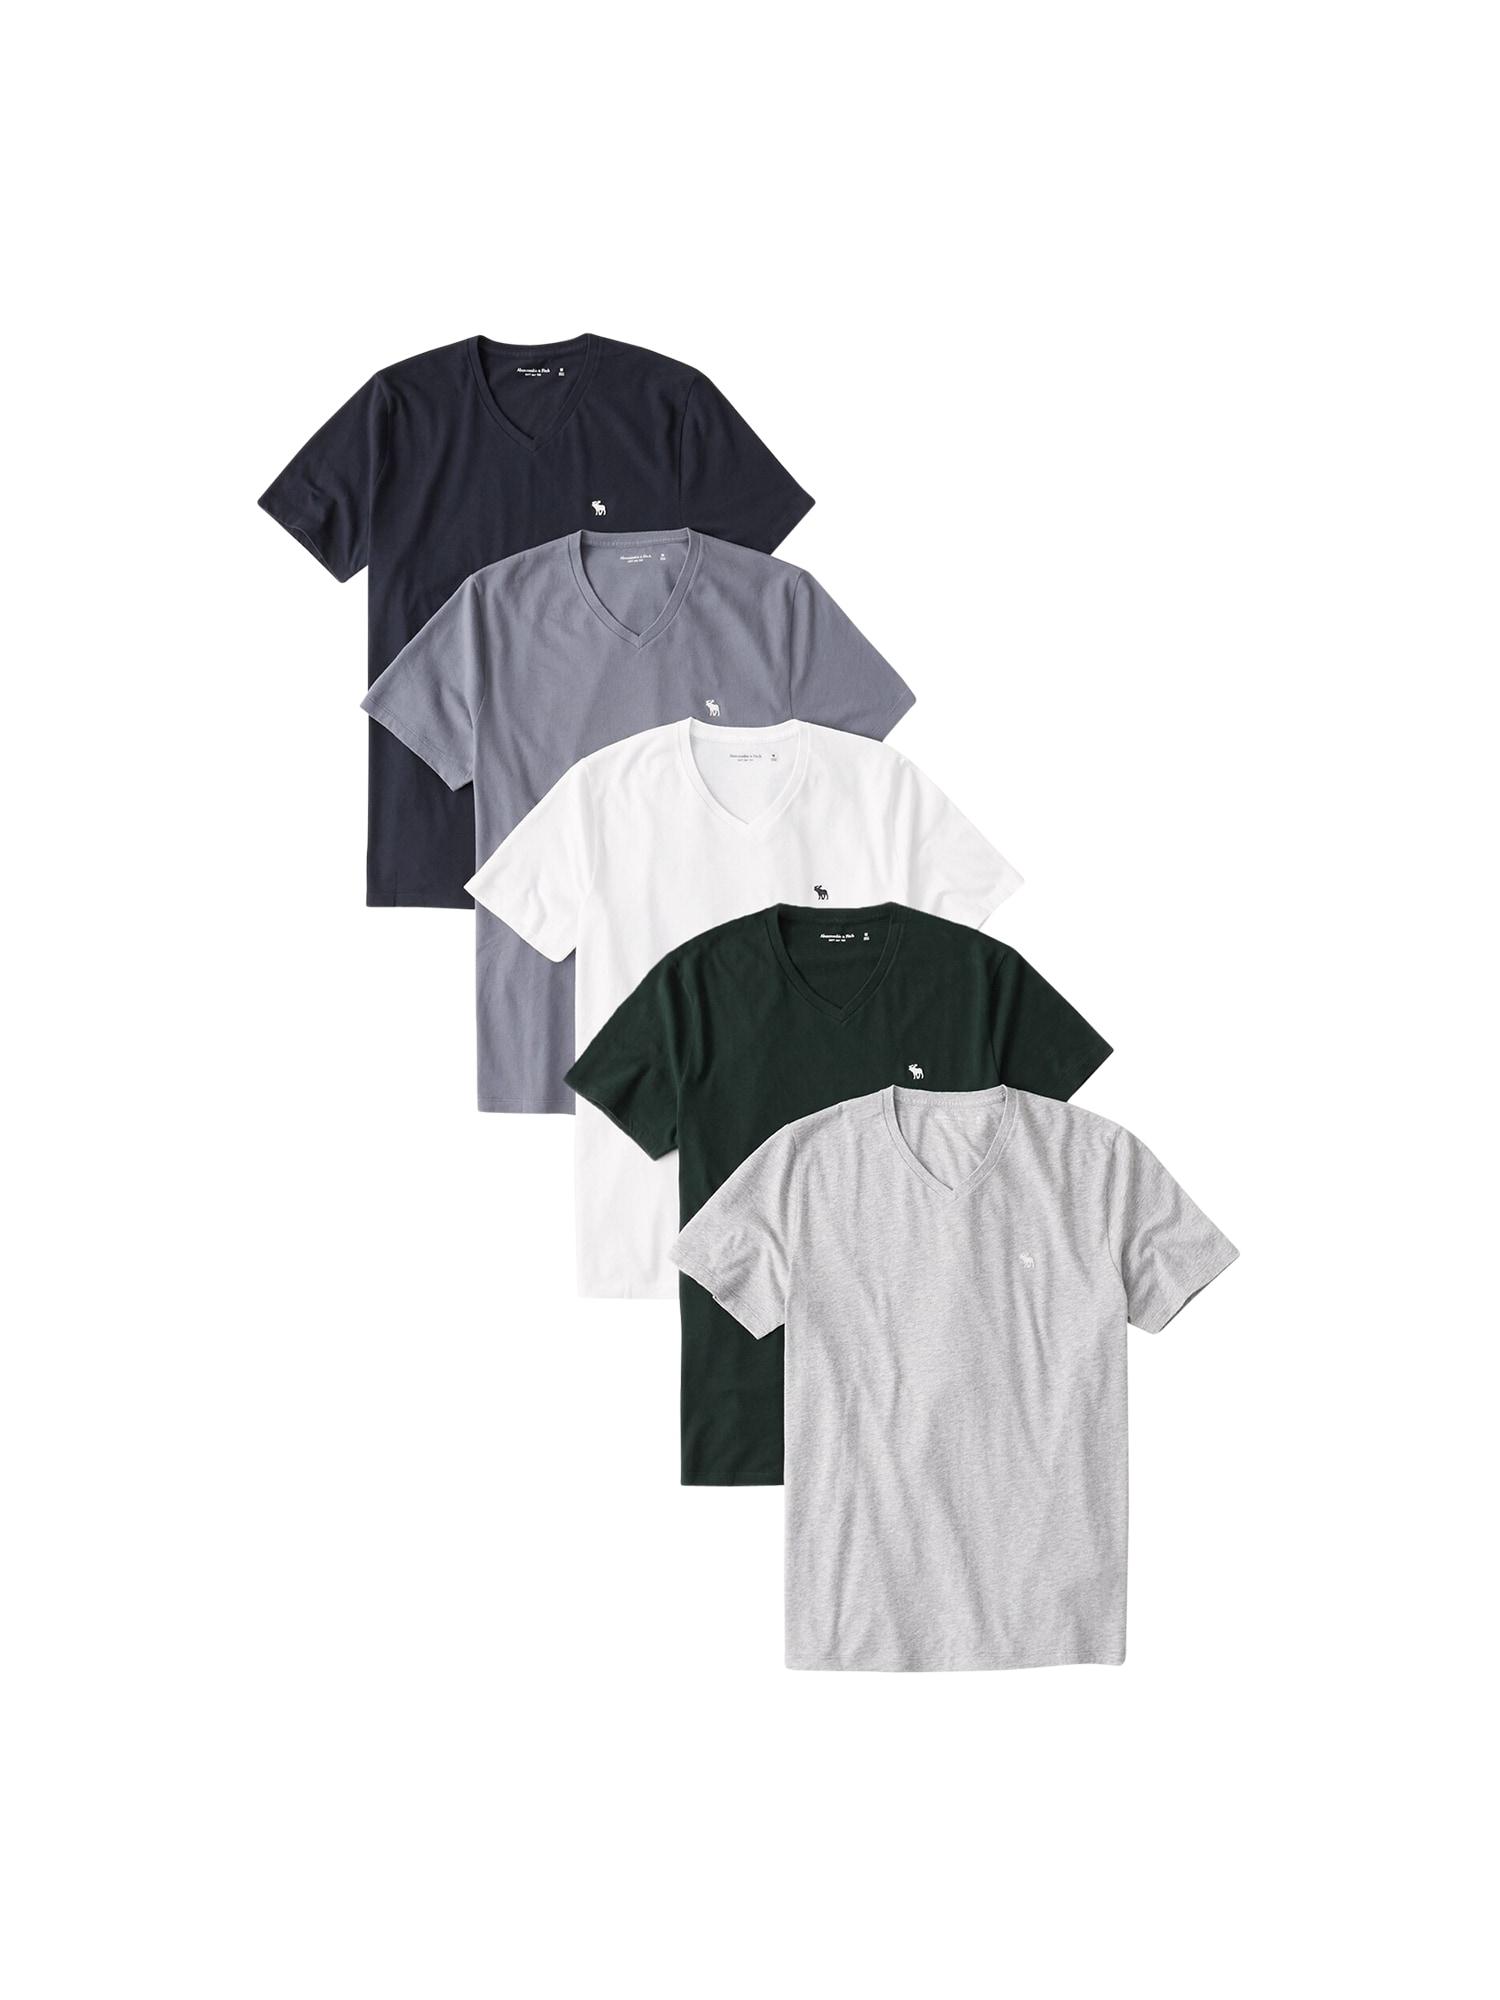 Abercrombie & Fitch Marškinėliai pilka / tamsiai mėlyna / balta / mėlyna / žalia